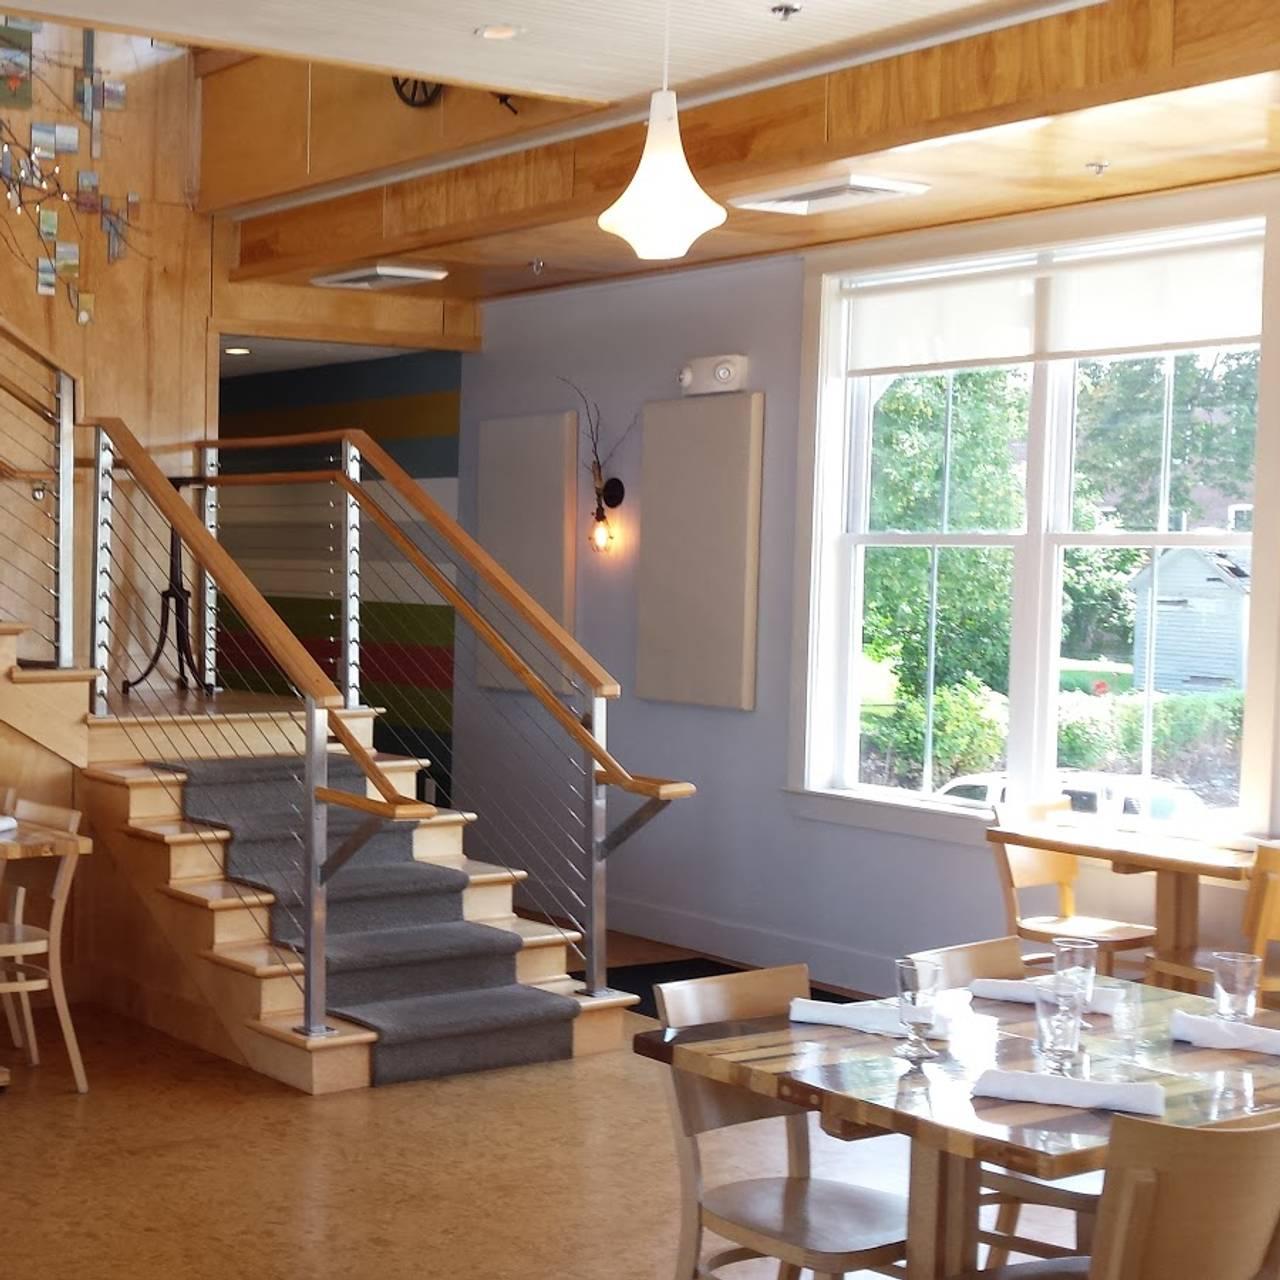 Trafford Restaurant Warren Ri Opentable